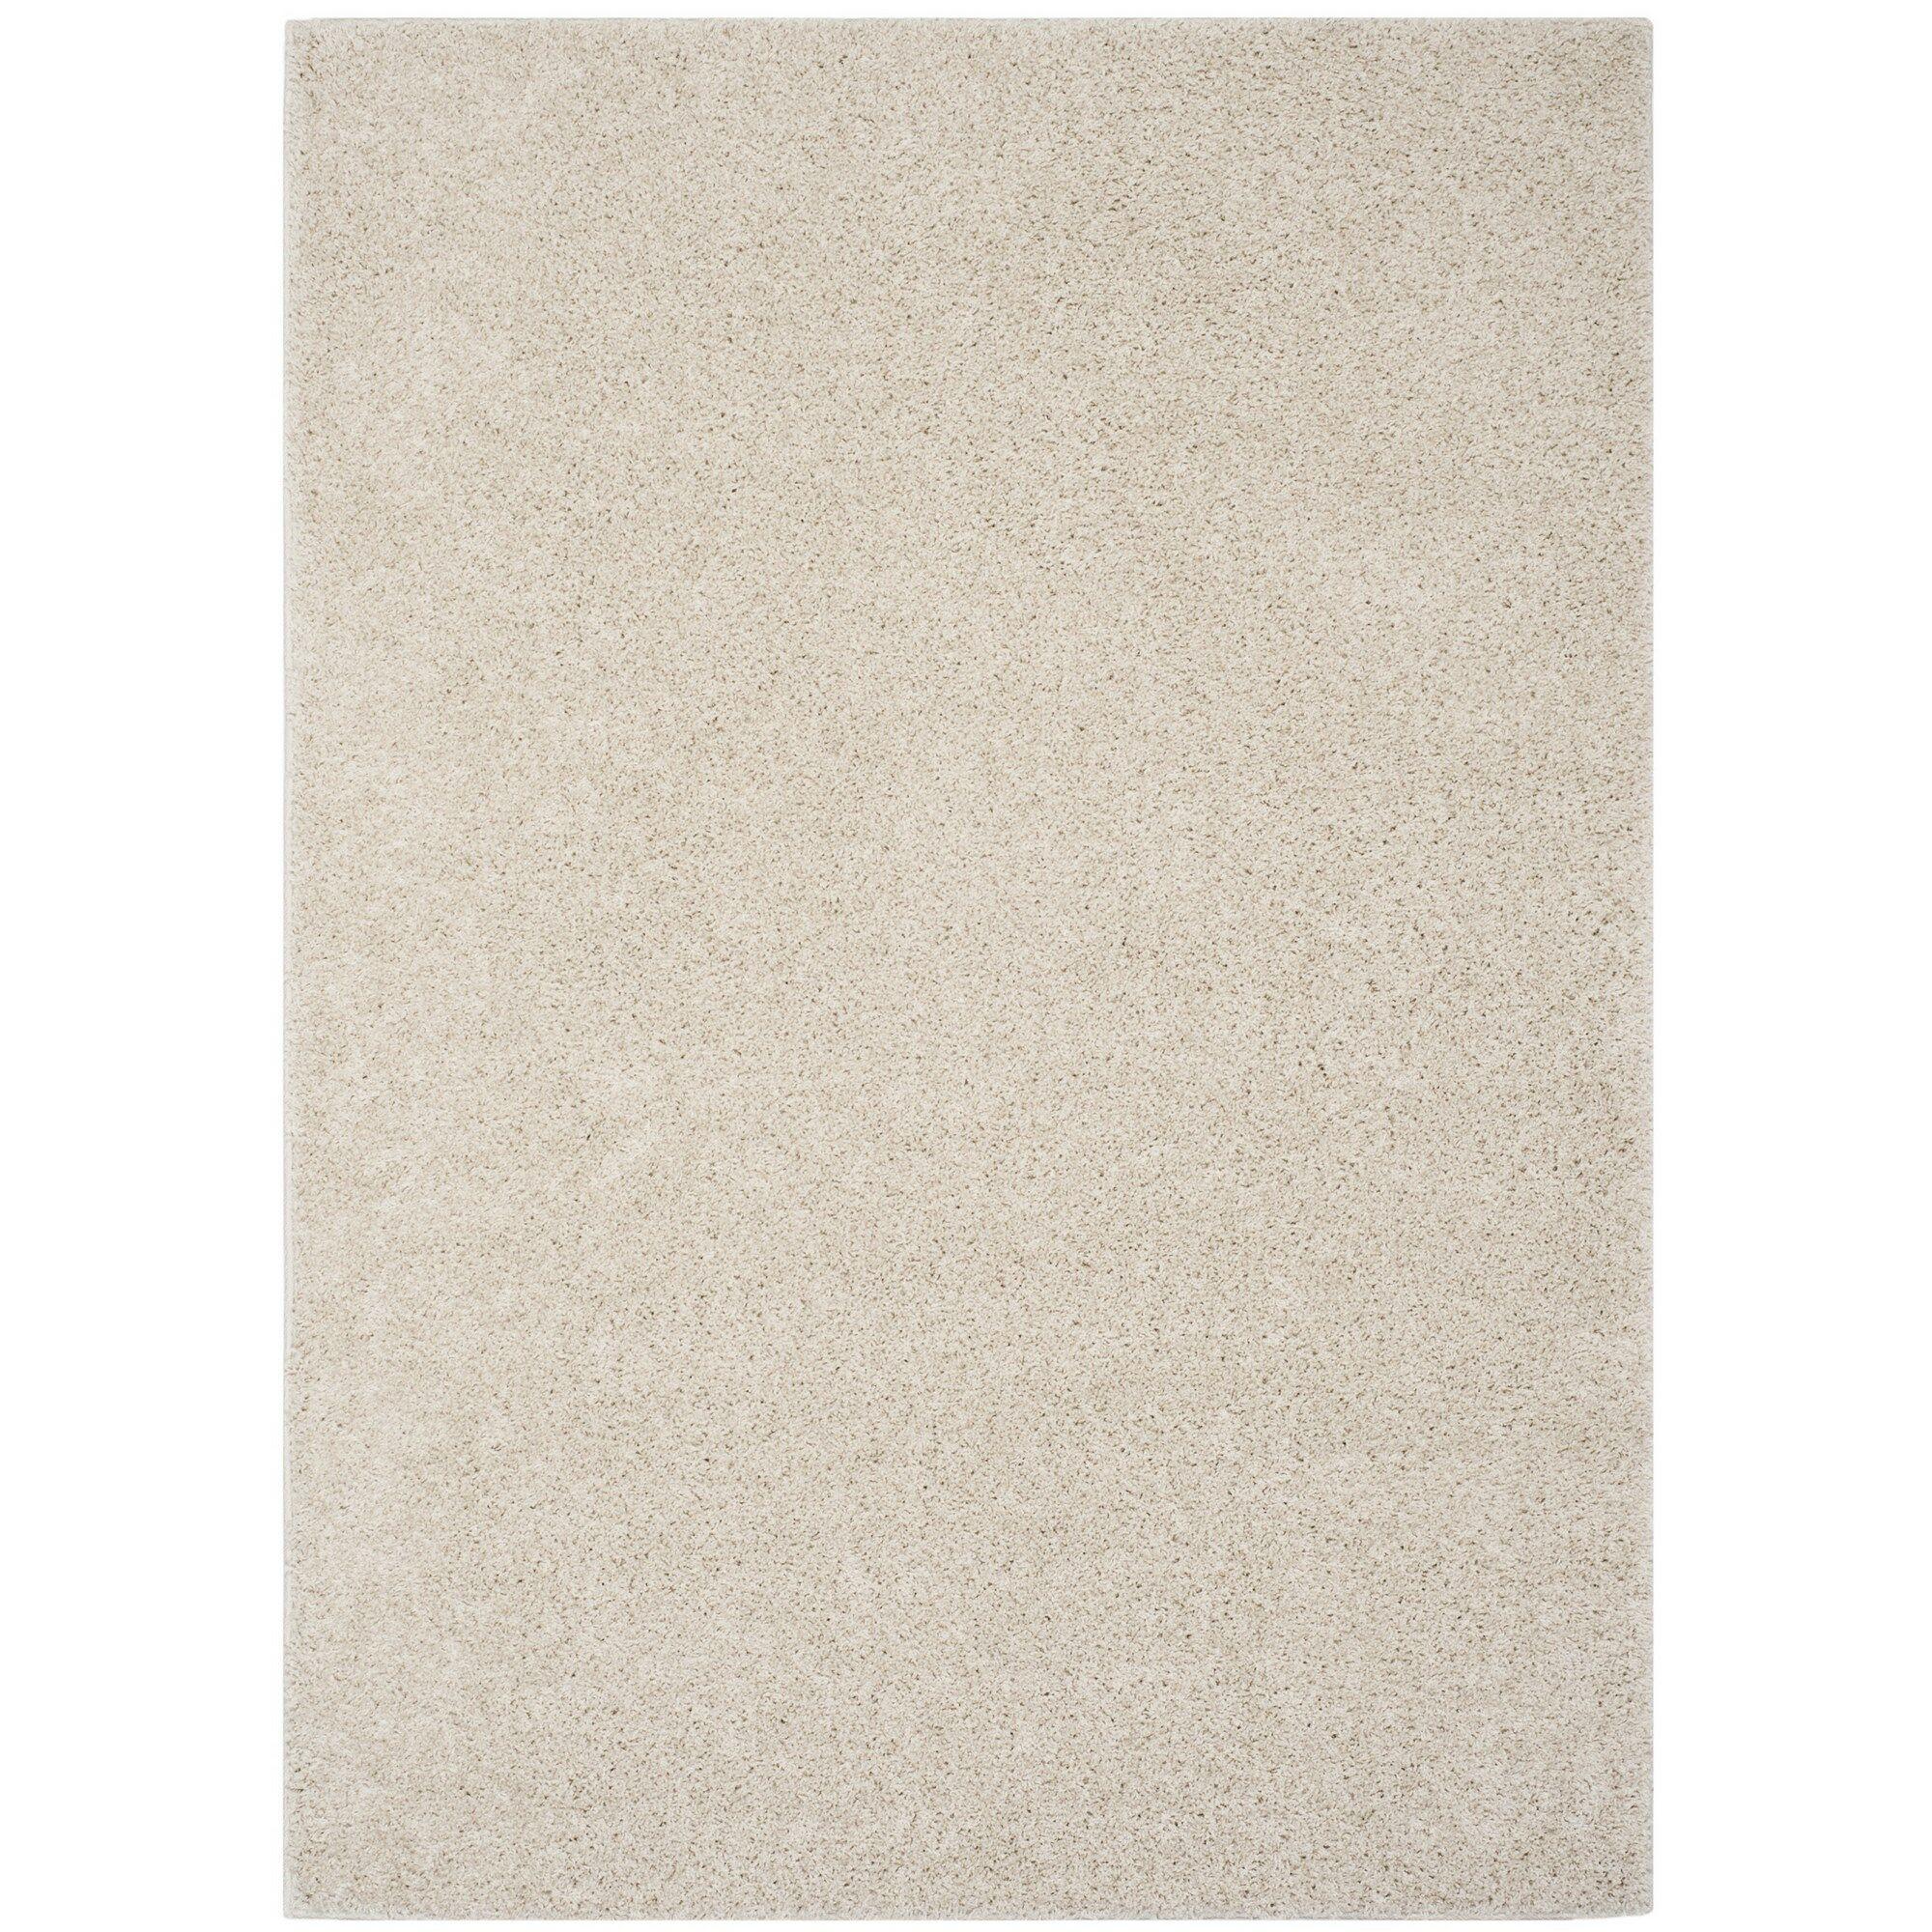 Helsel Ivory Area Rug Rug Size: Square 6'7